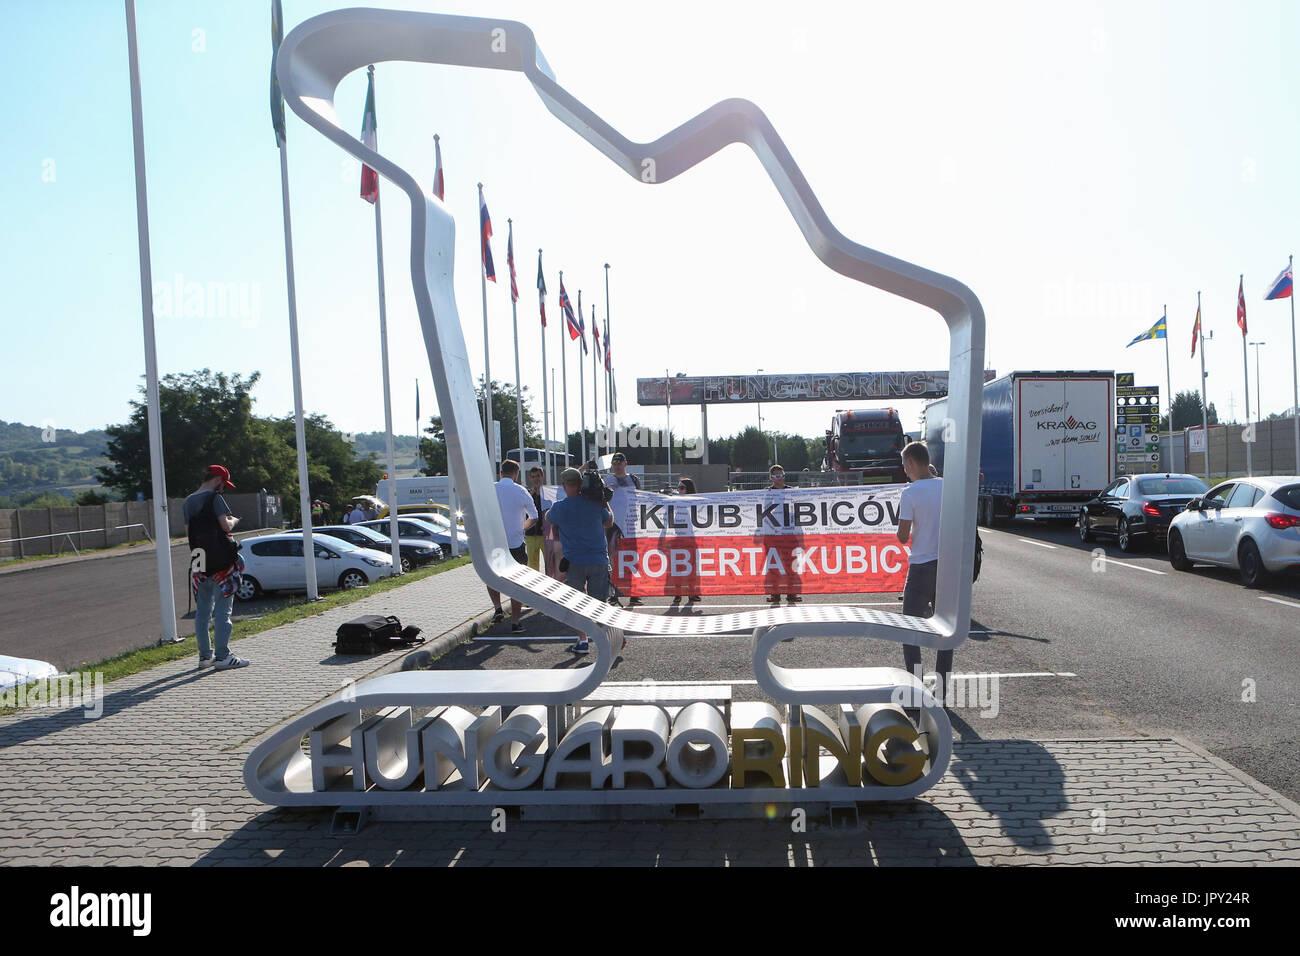 Budapest, Ungarn. 2. August 2017. 1. August 2017, Hungaroring, Budapest, Ungarn; Formel 1 In Saison-Test; Roberta Stockbild